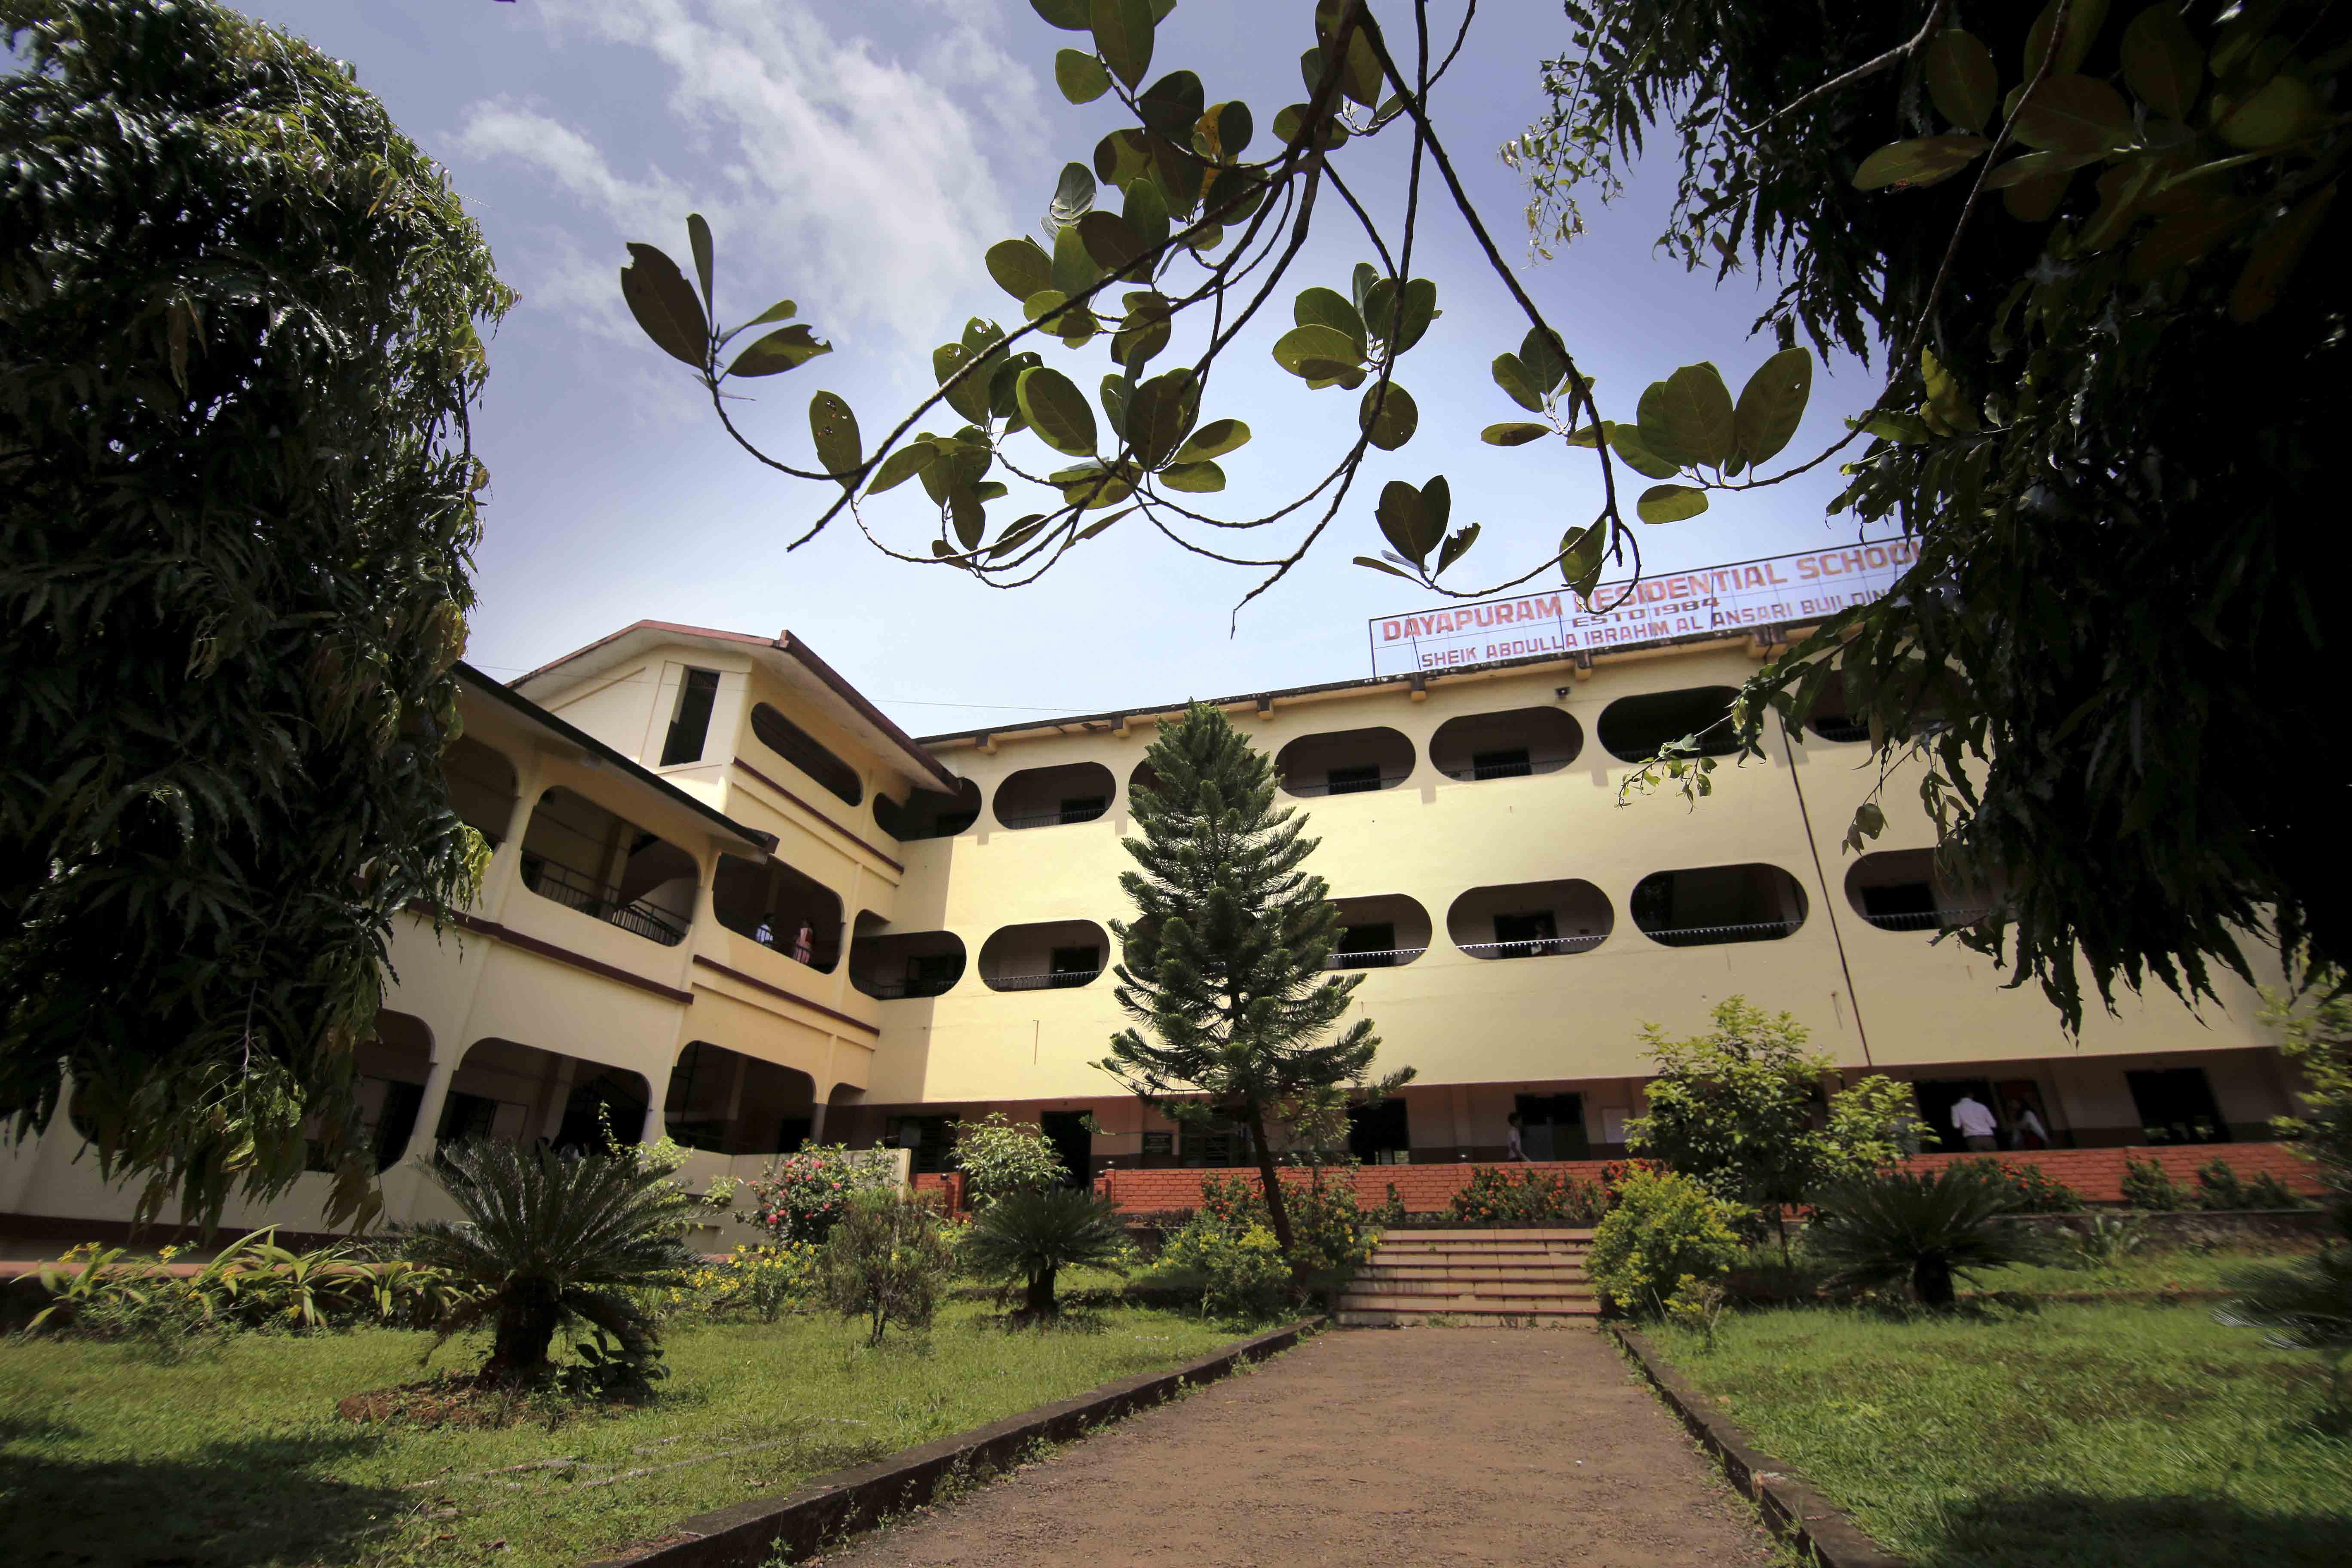 DAYAPURAM RESIDENTIAL SCHOOL R E COLLEGE P O KOZHIKODE KERALA 930044